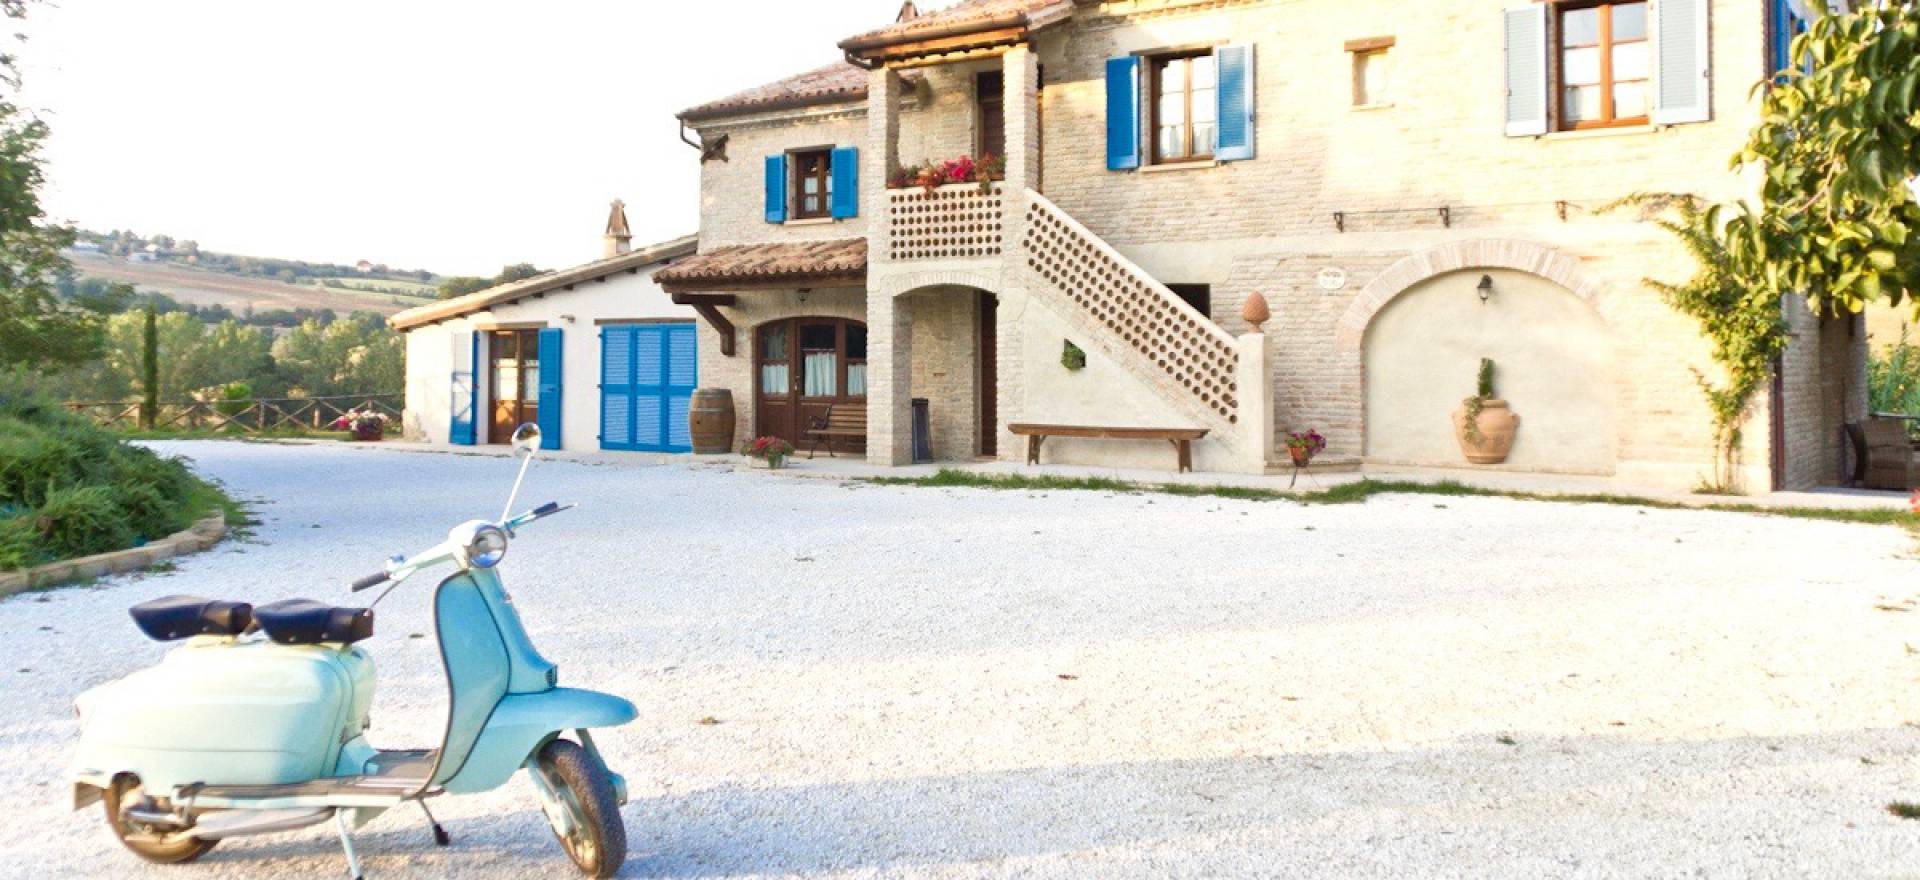 Agriturismo Le Marche Knusse agriturismo bij authentiek dorpje in le Marche